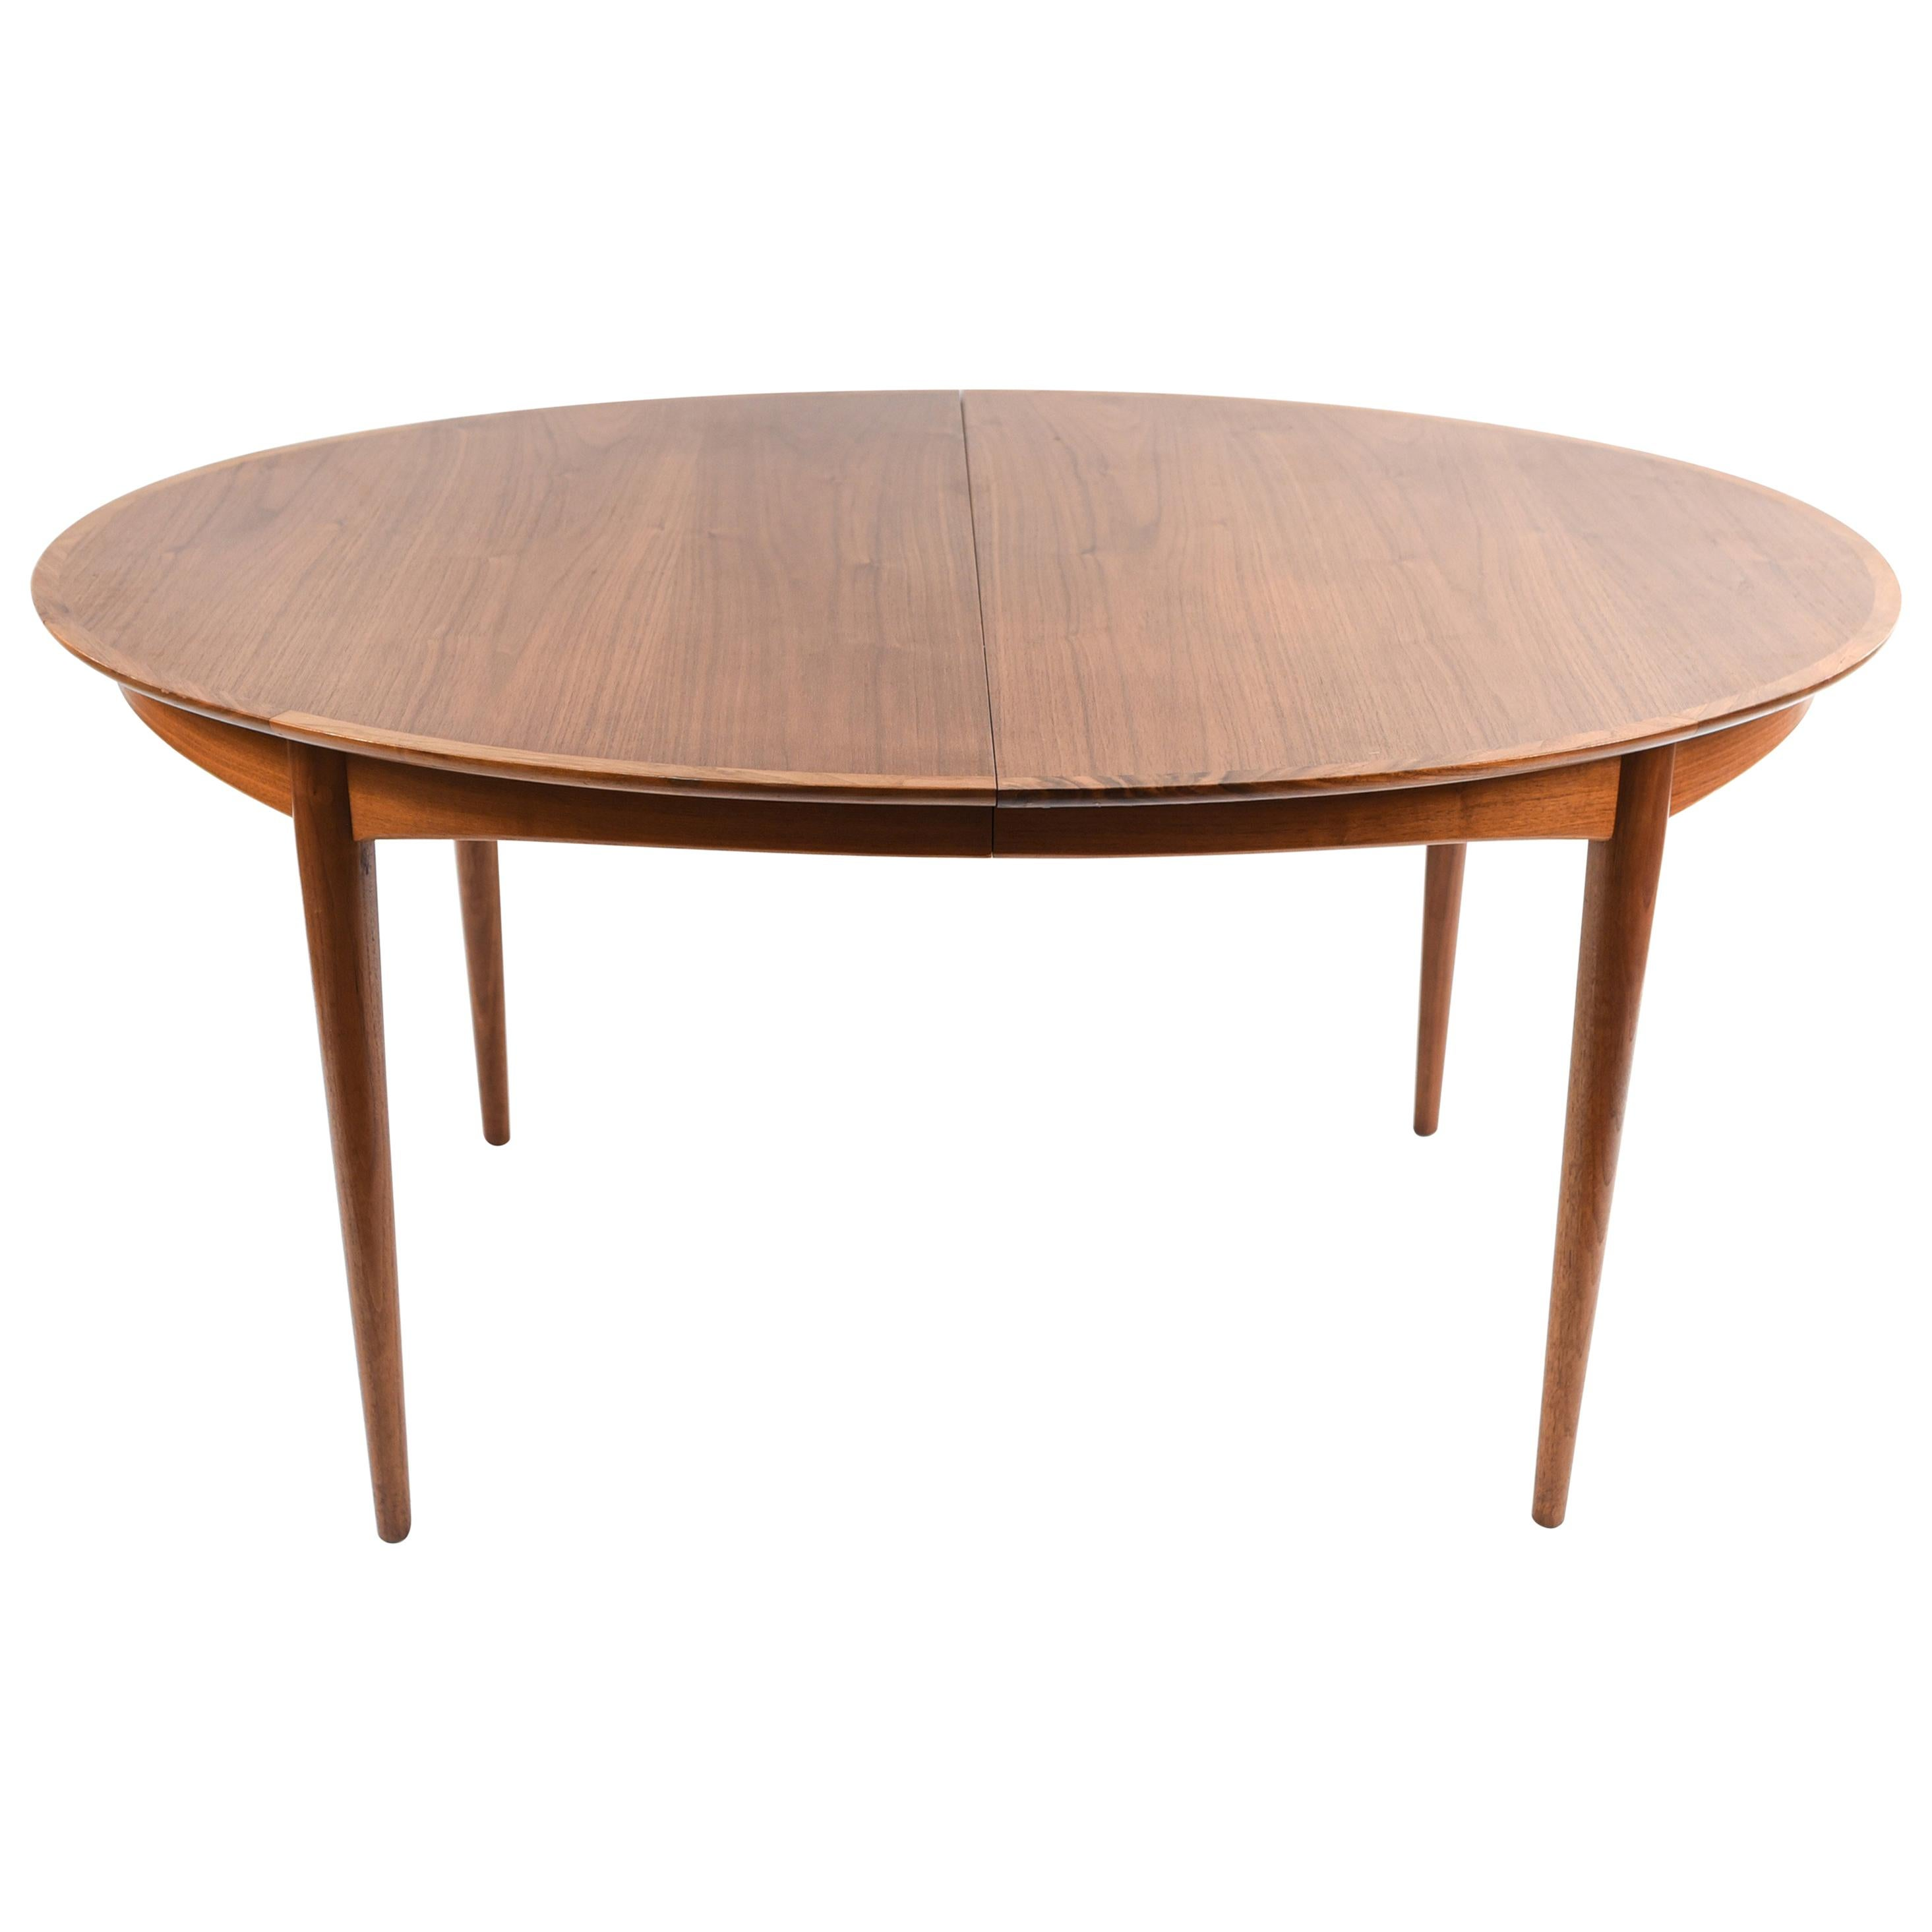 Midcentury Drexel Dining Table